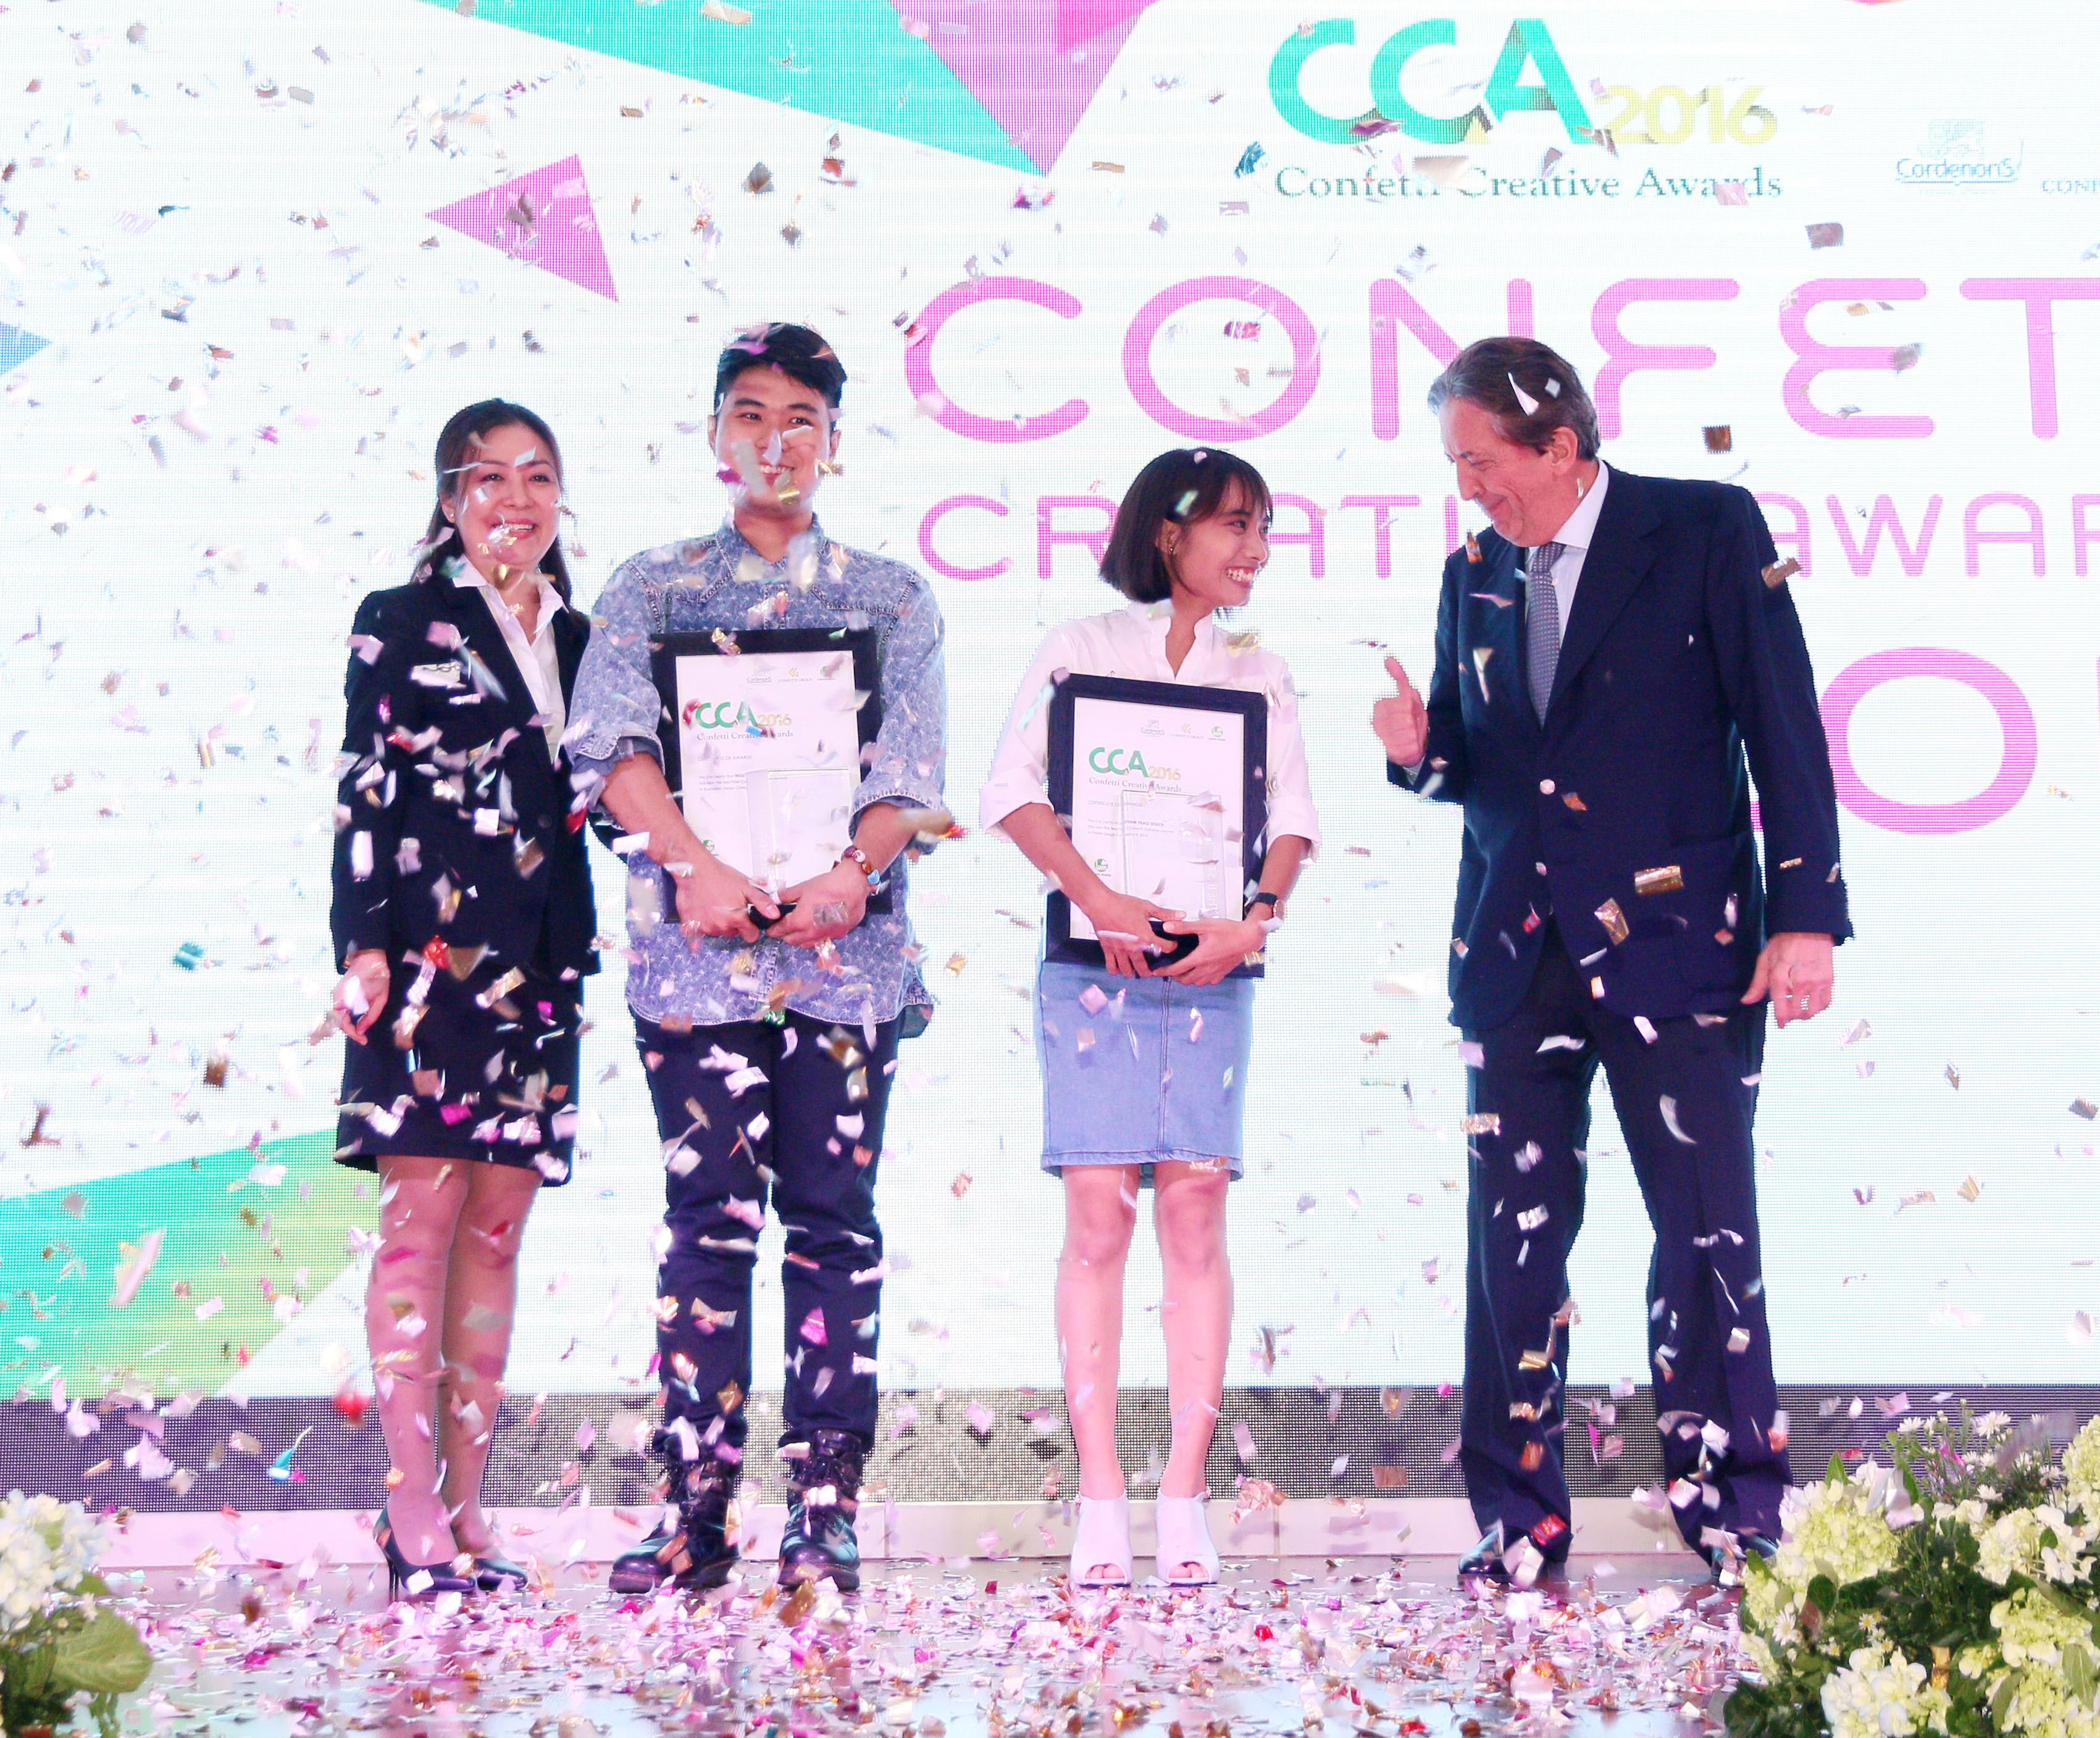 Cuộc thi thiết kế Confetti Creative Awards 2016 | Giải Nhất